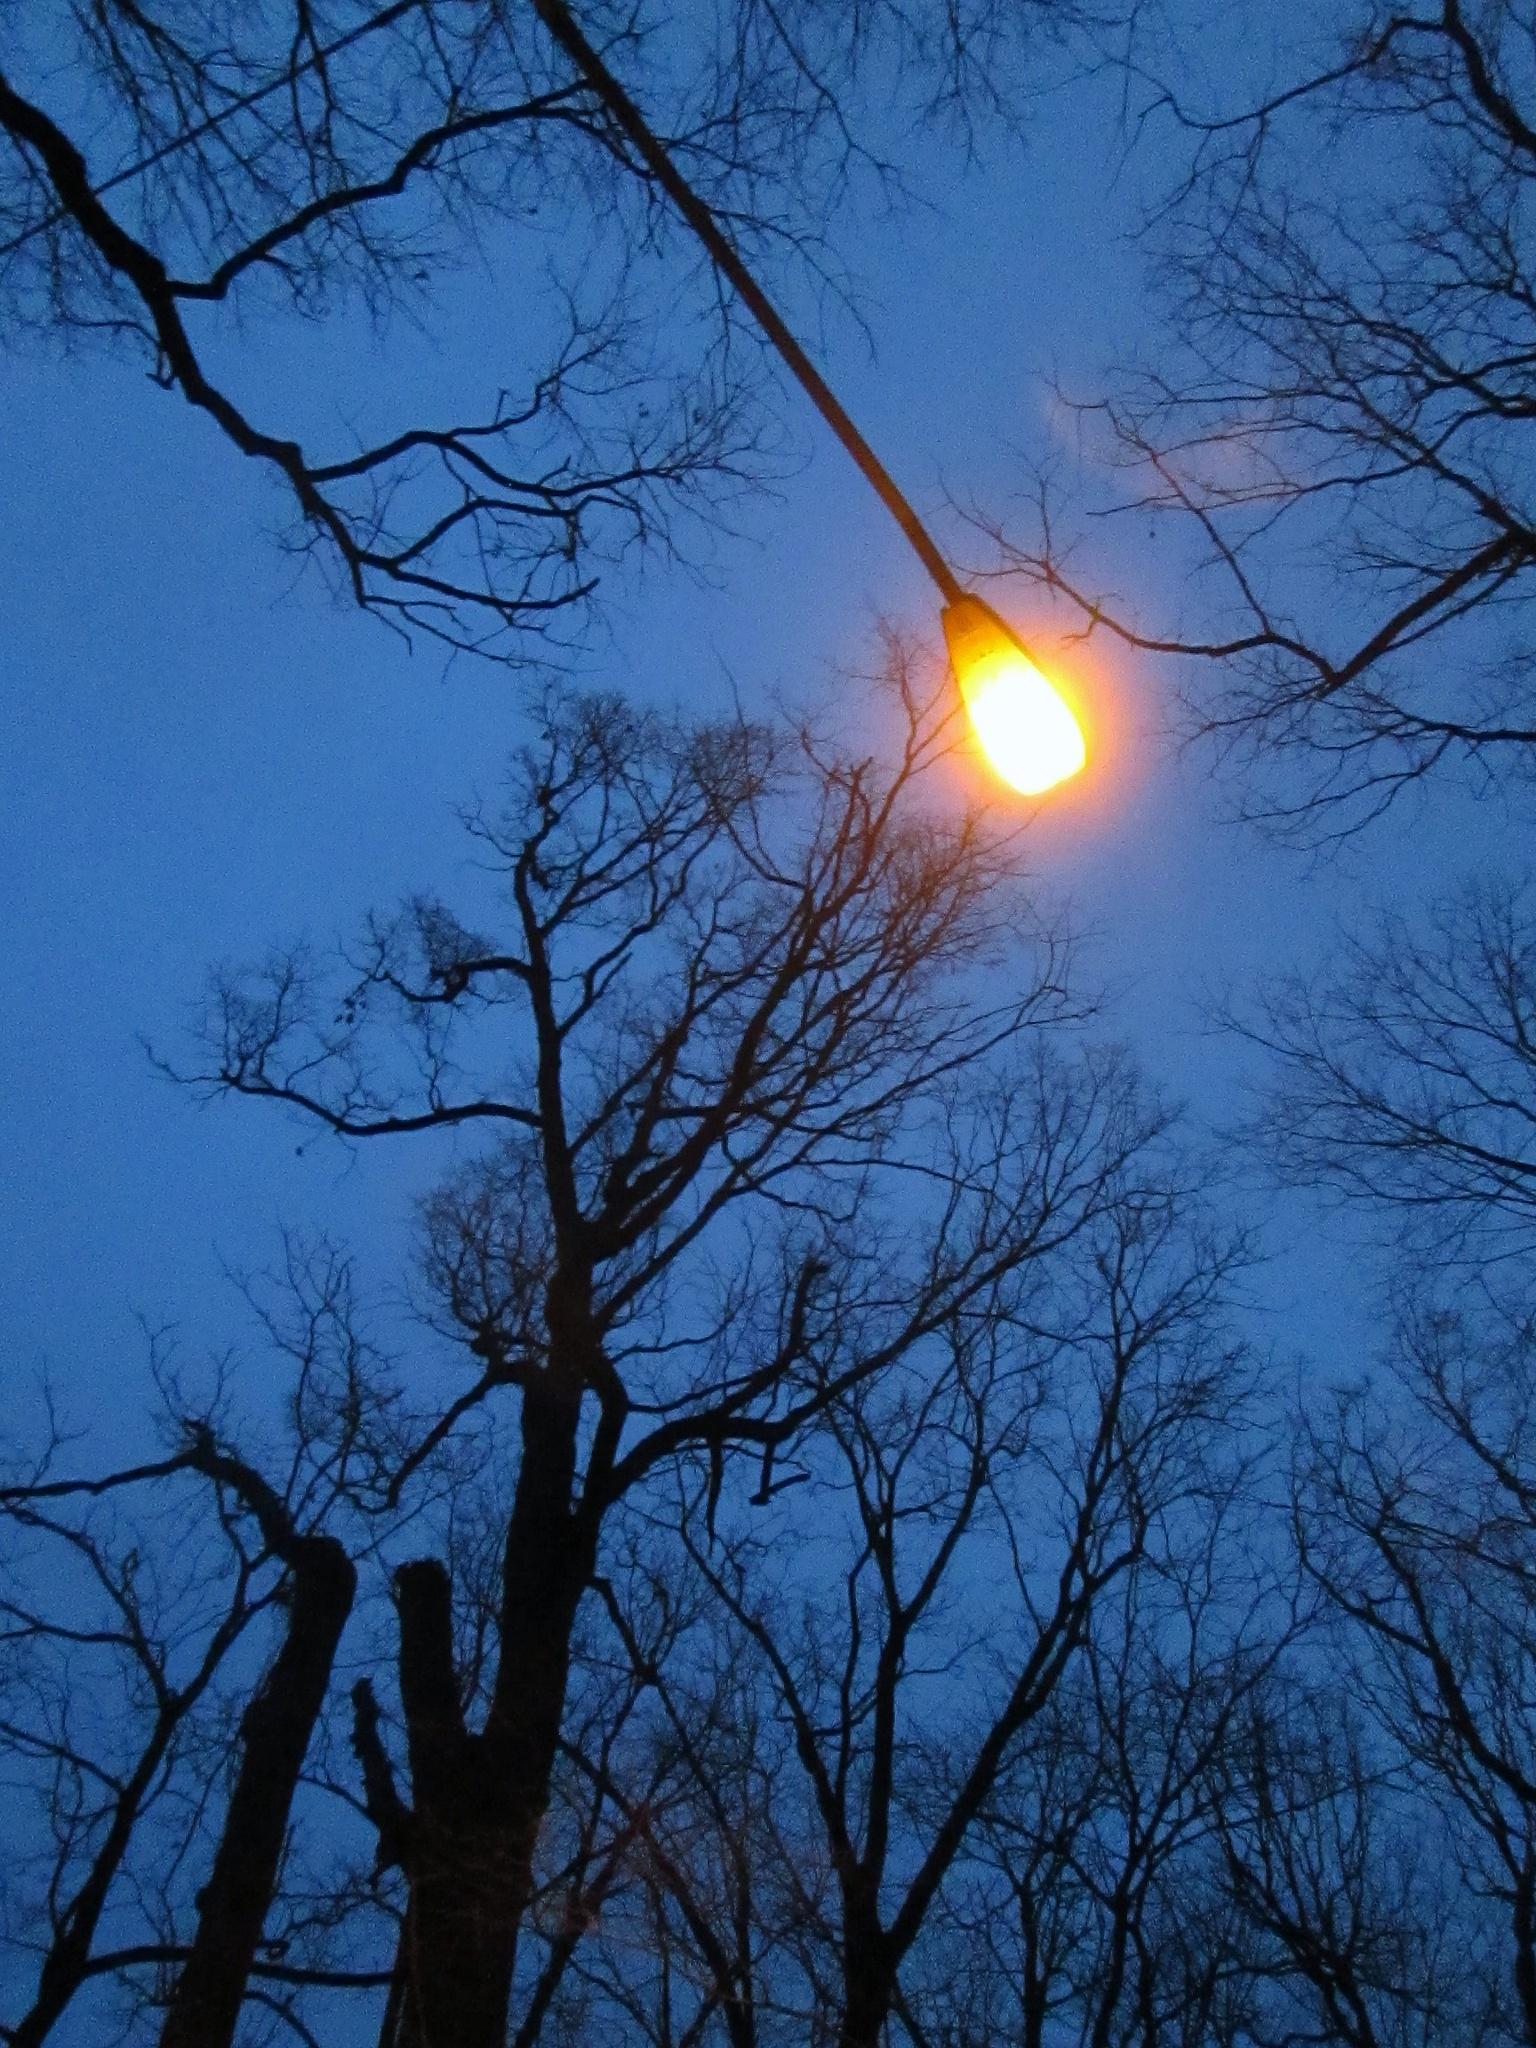 Illumination by Zebb